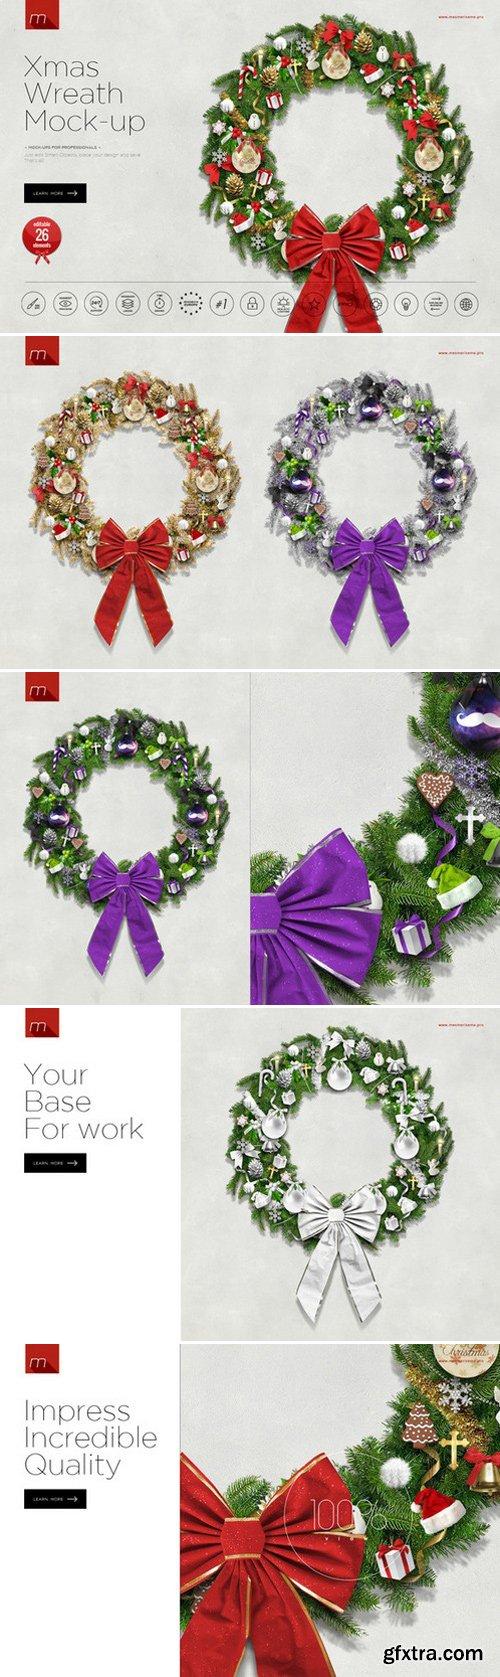 CM - Christmas Wreath Creator Mock-up 433105